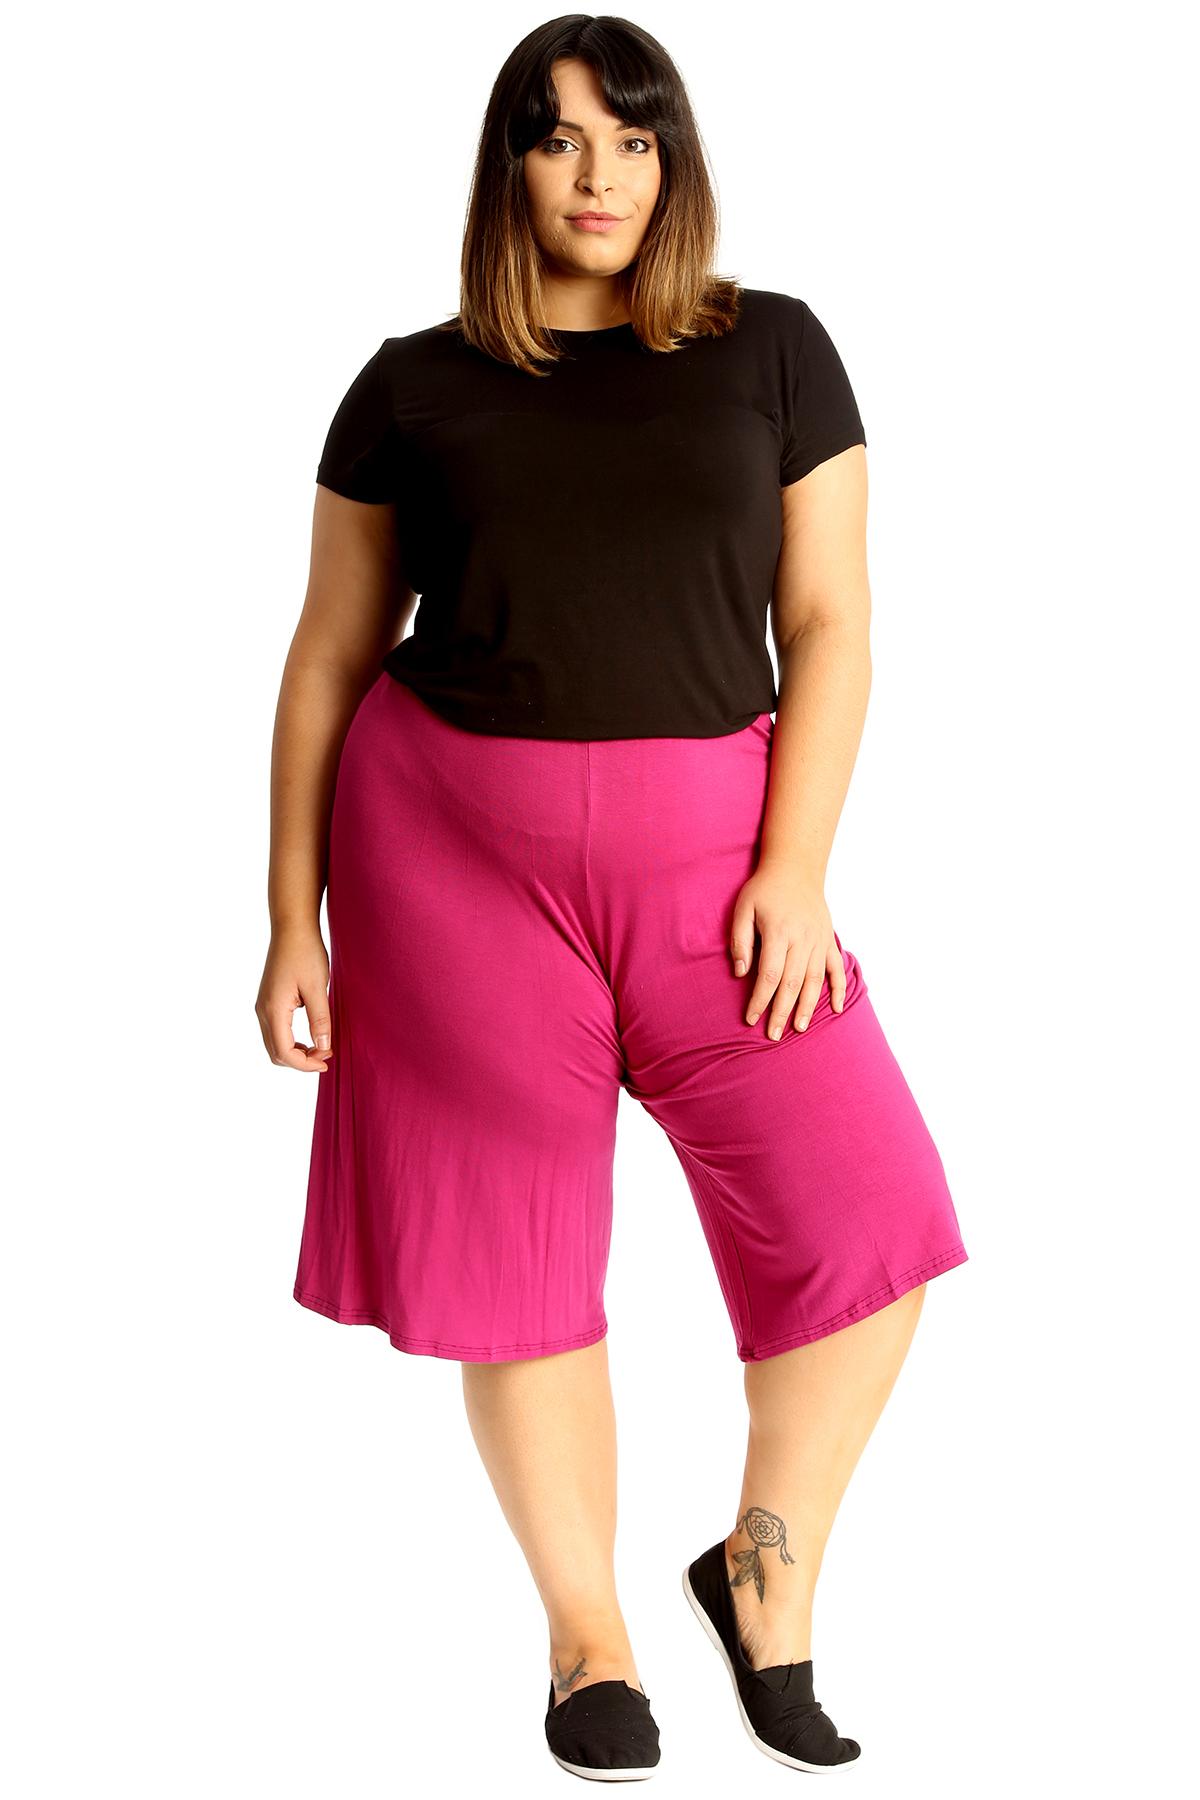 New-Womens-Plus-Size-Culottes-Ladies-Plain-Shorts-Palazzo-Elastic-Pants-Summer thumbnail 62